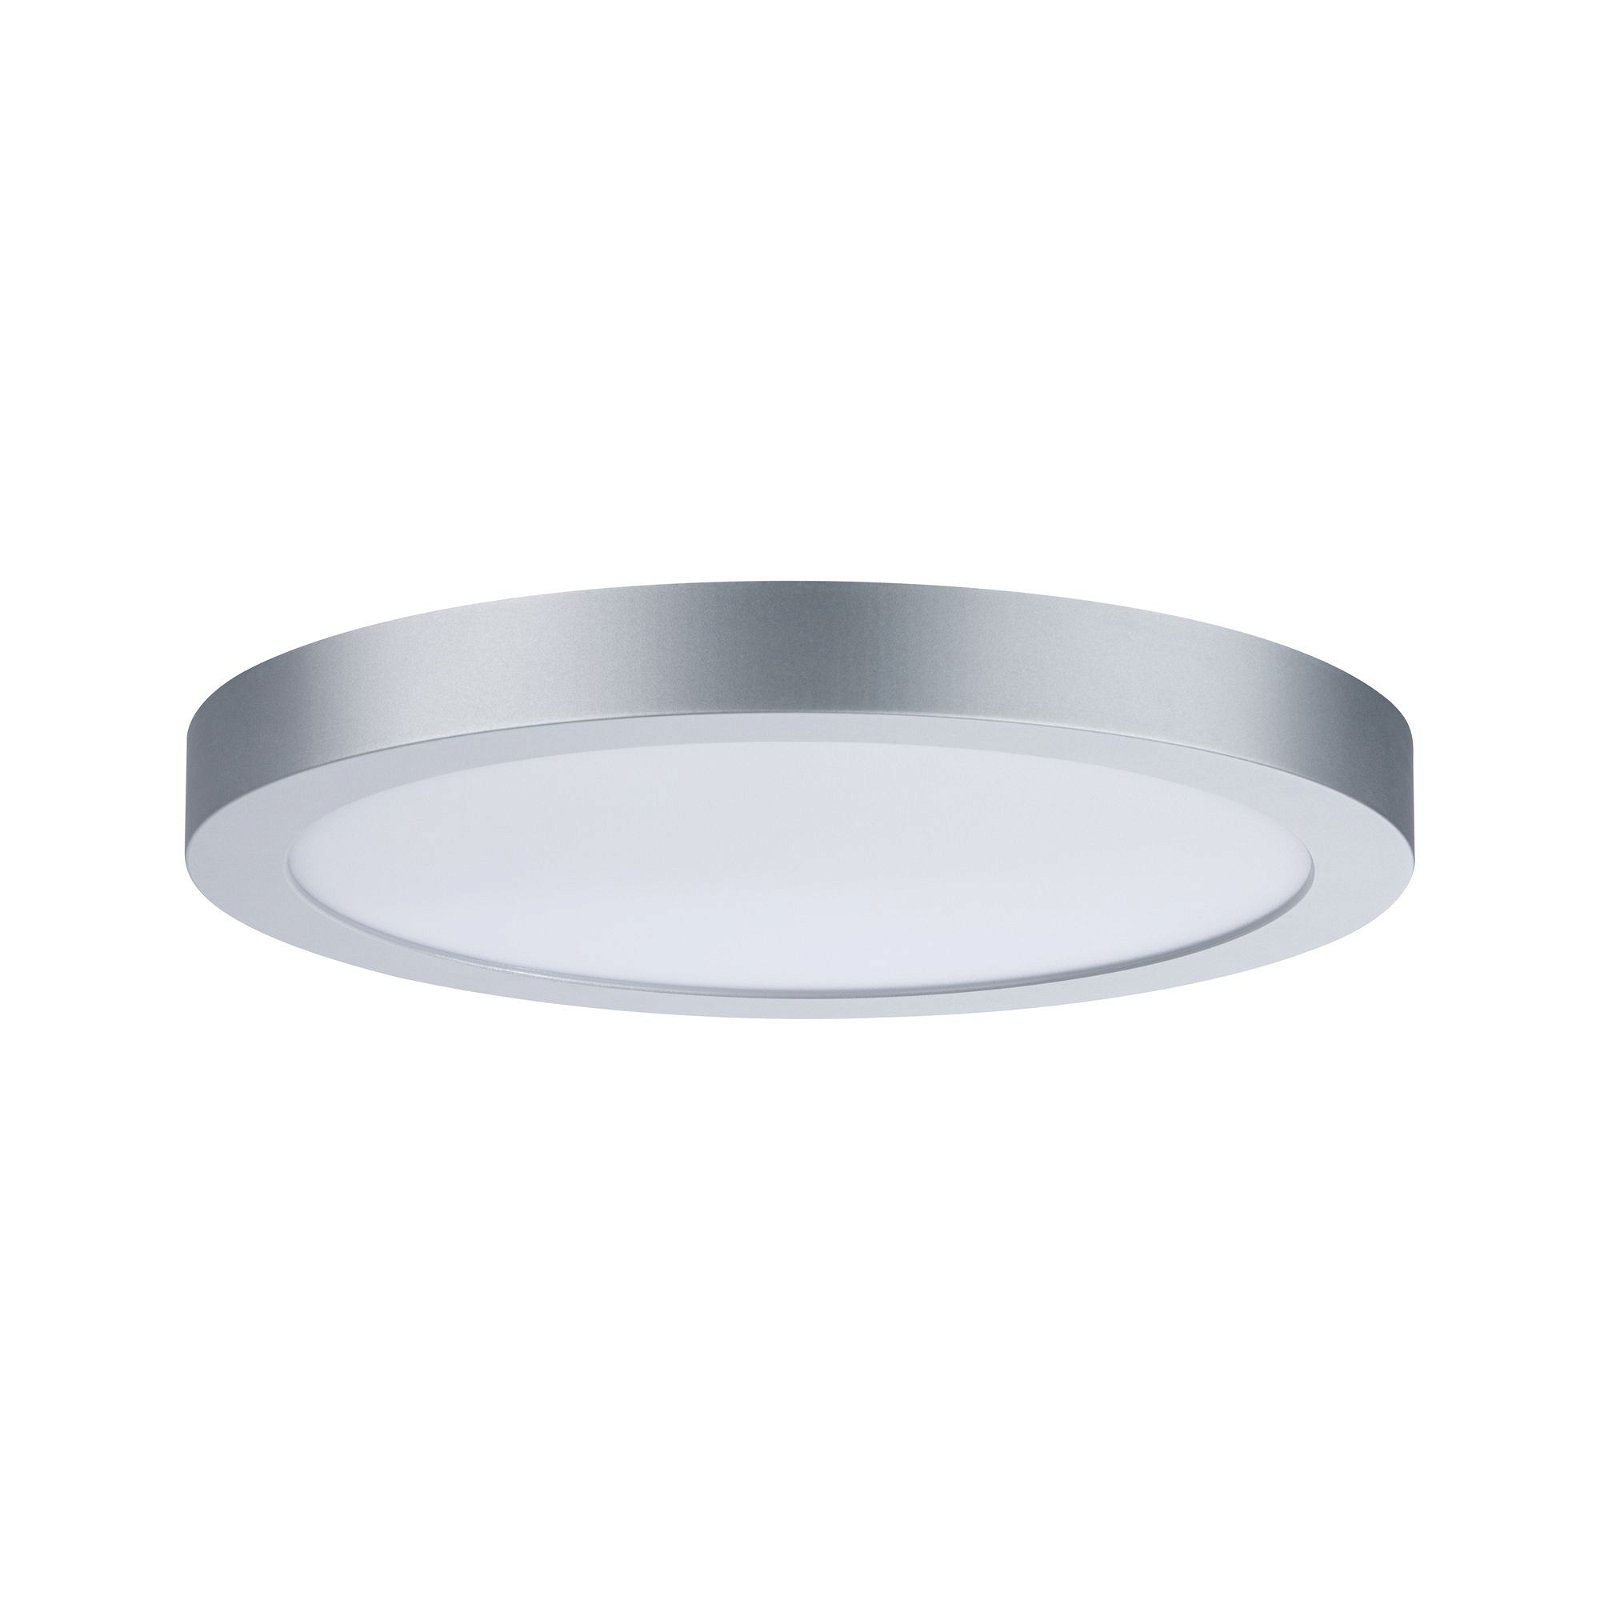 LED Panel Abia round 300mm 3200lm 2700K Chrome matt